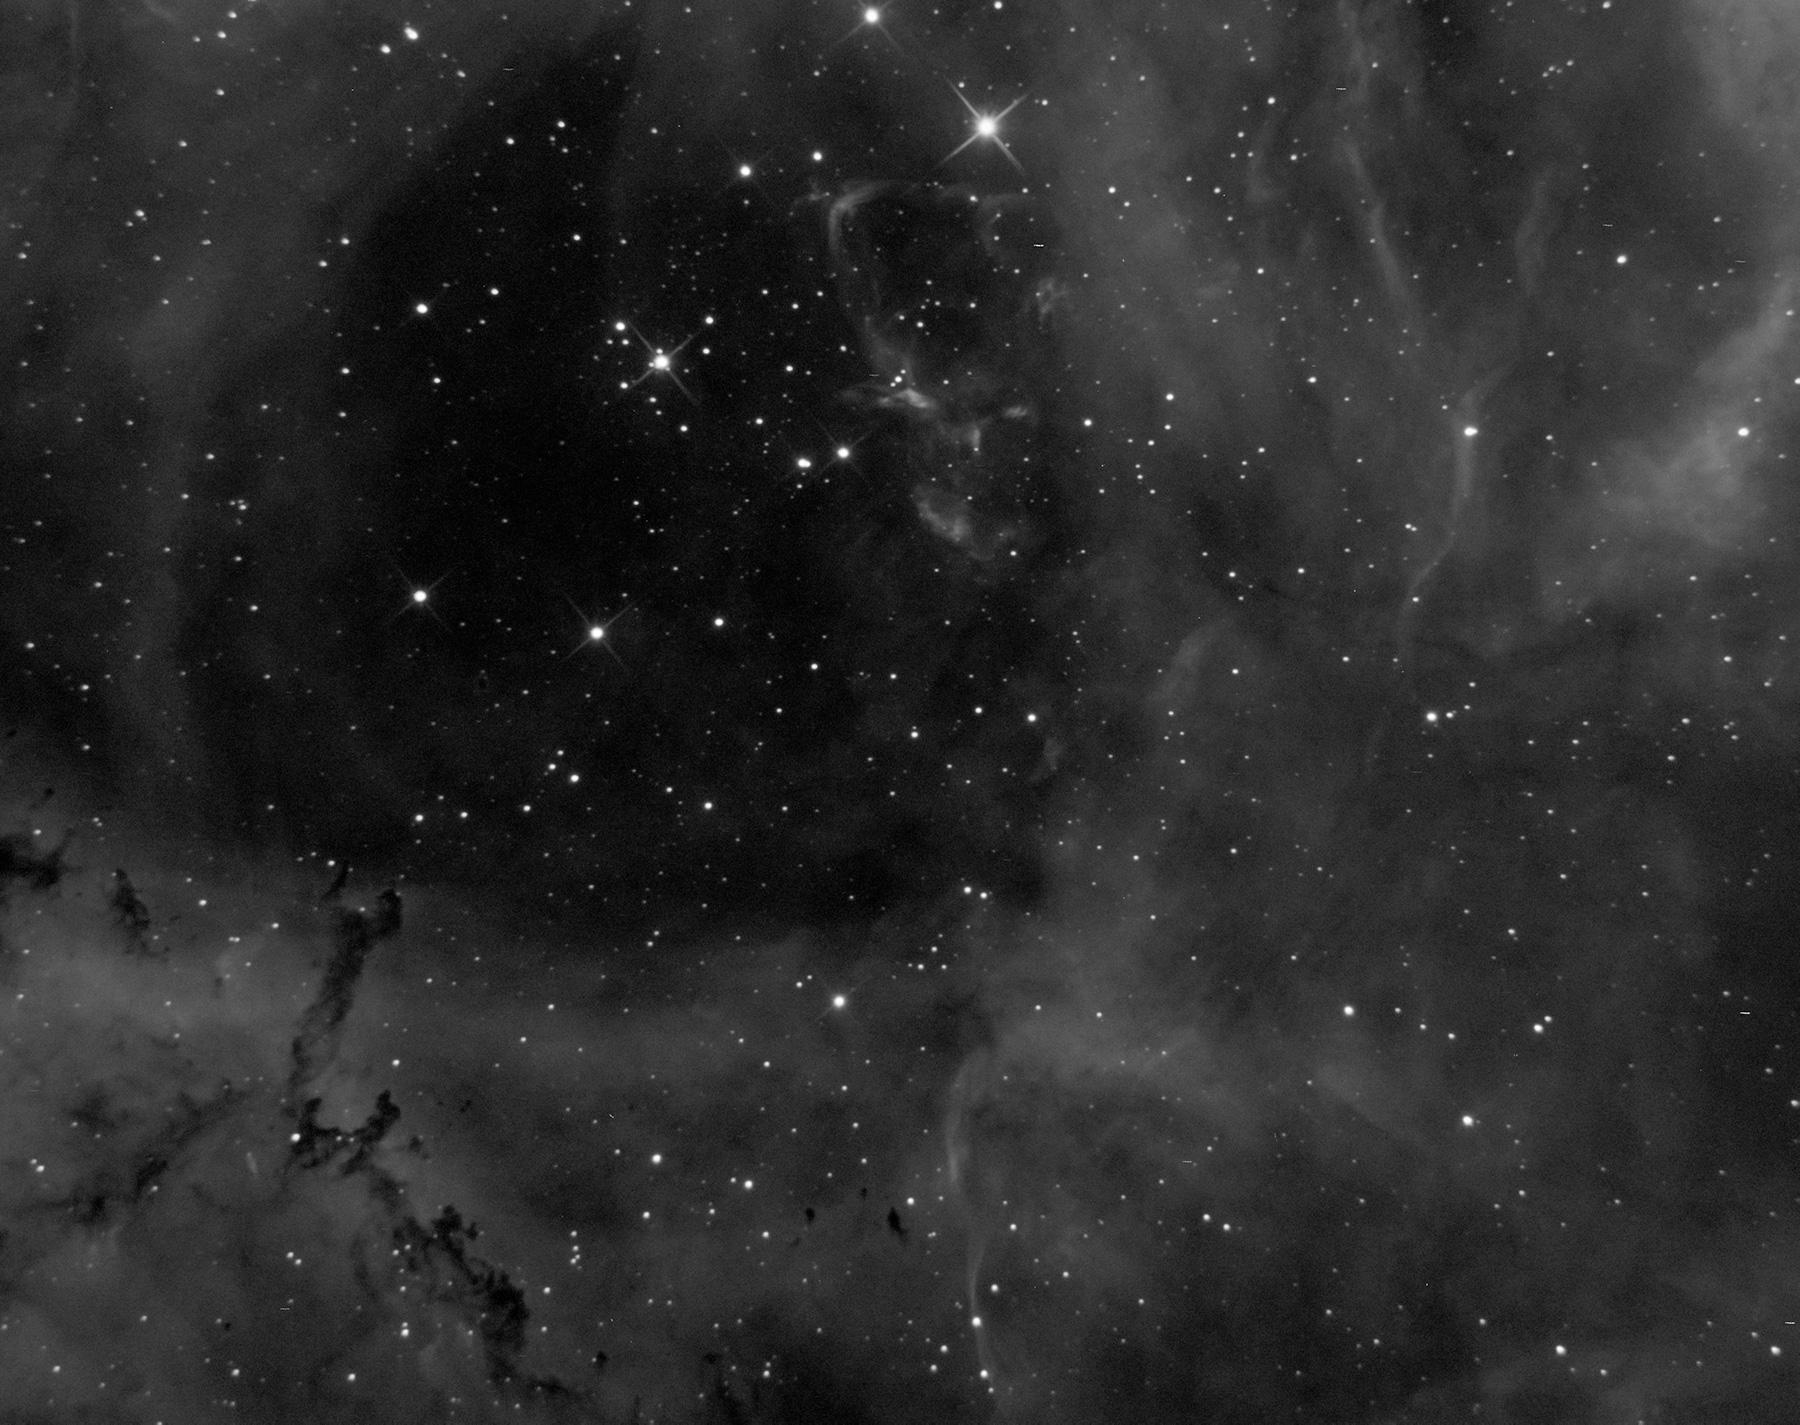 08 NGC2244 Ha -15C 10x300s dbf Forthimage 2020-02-04